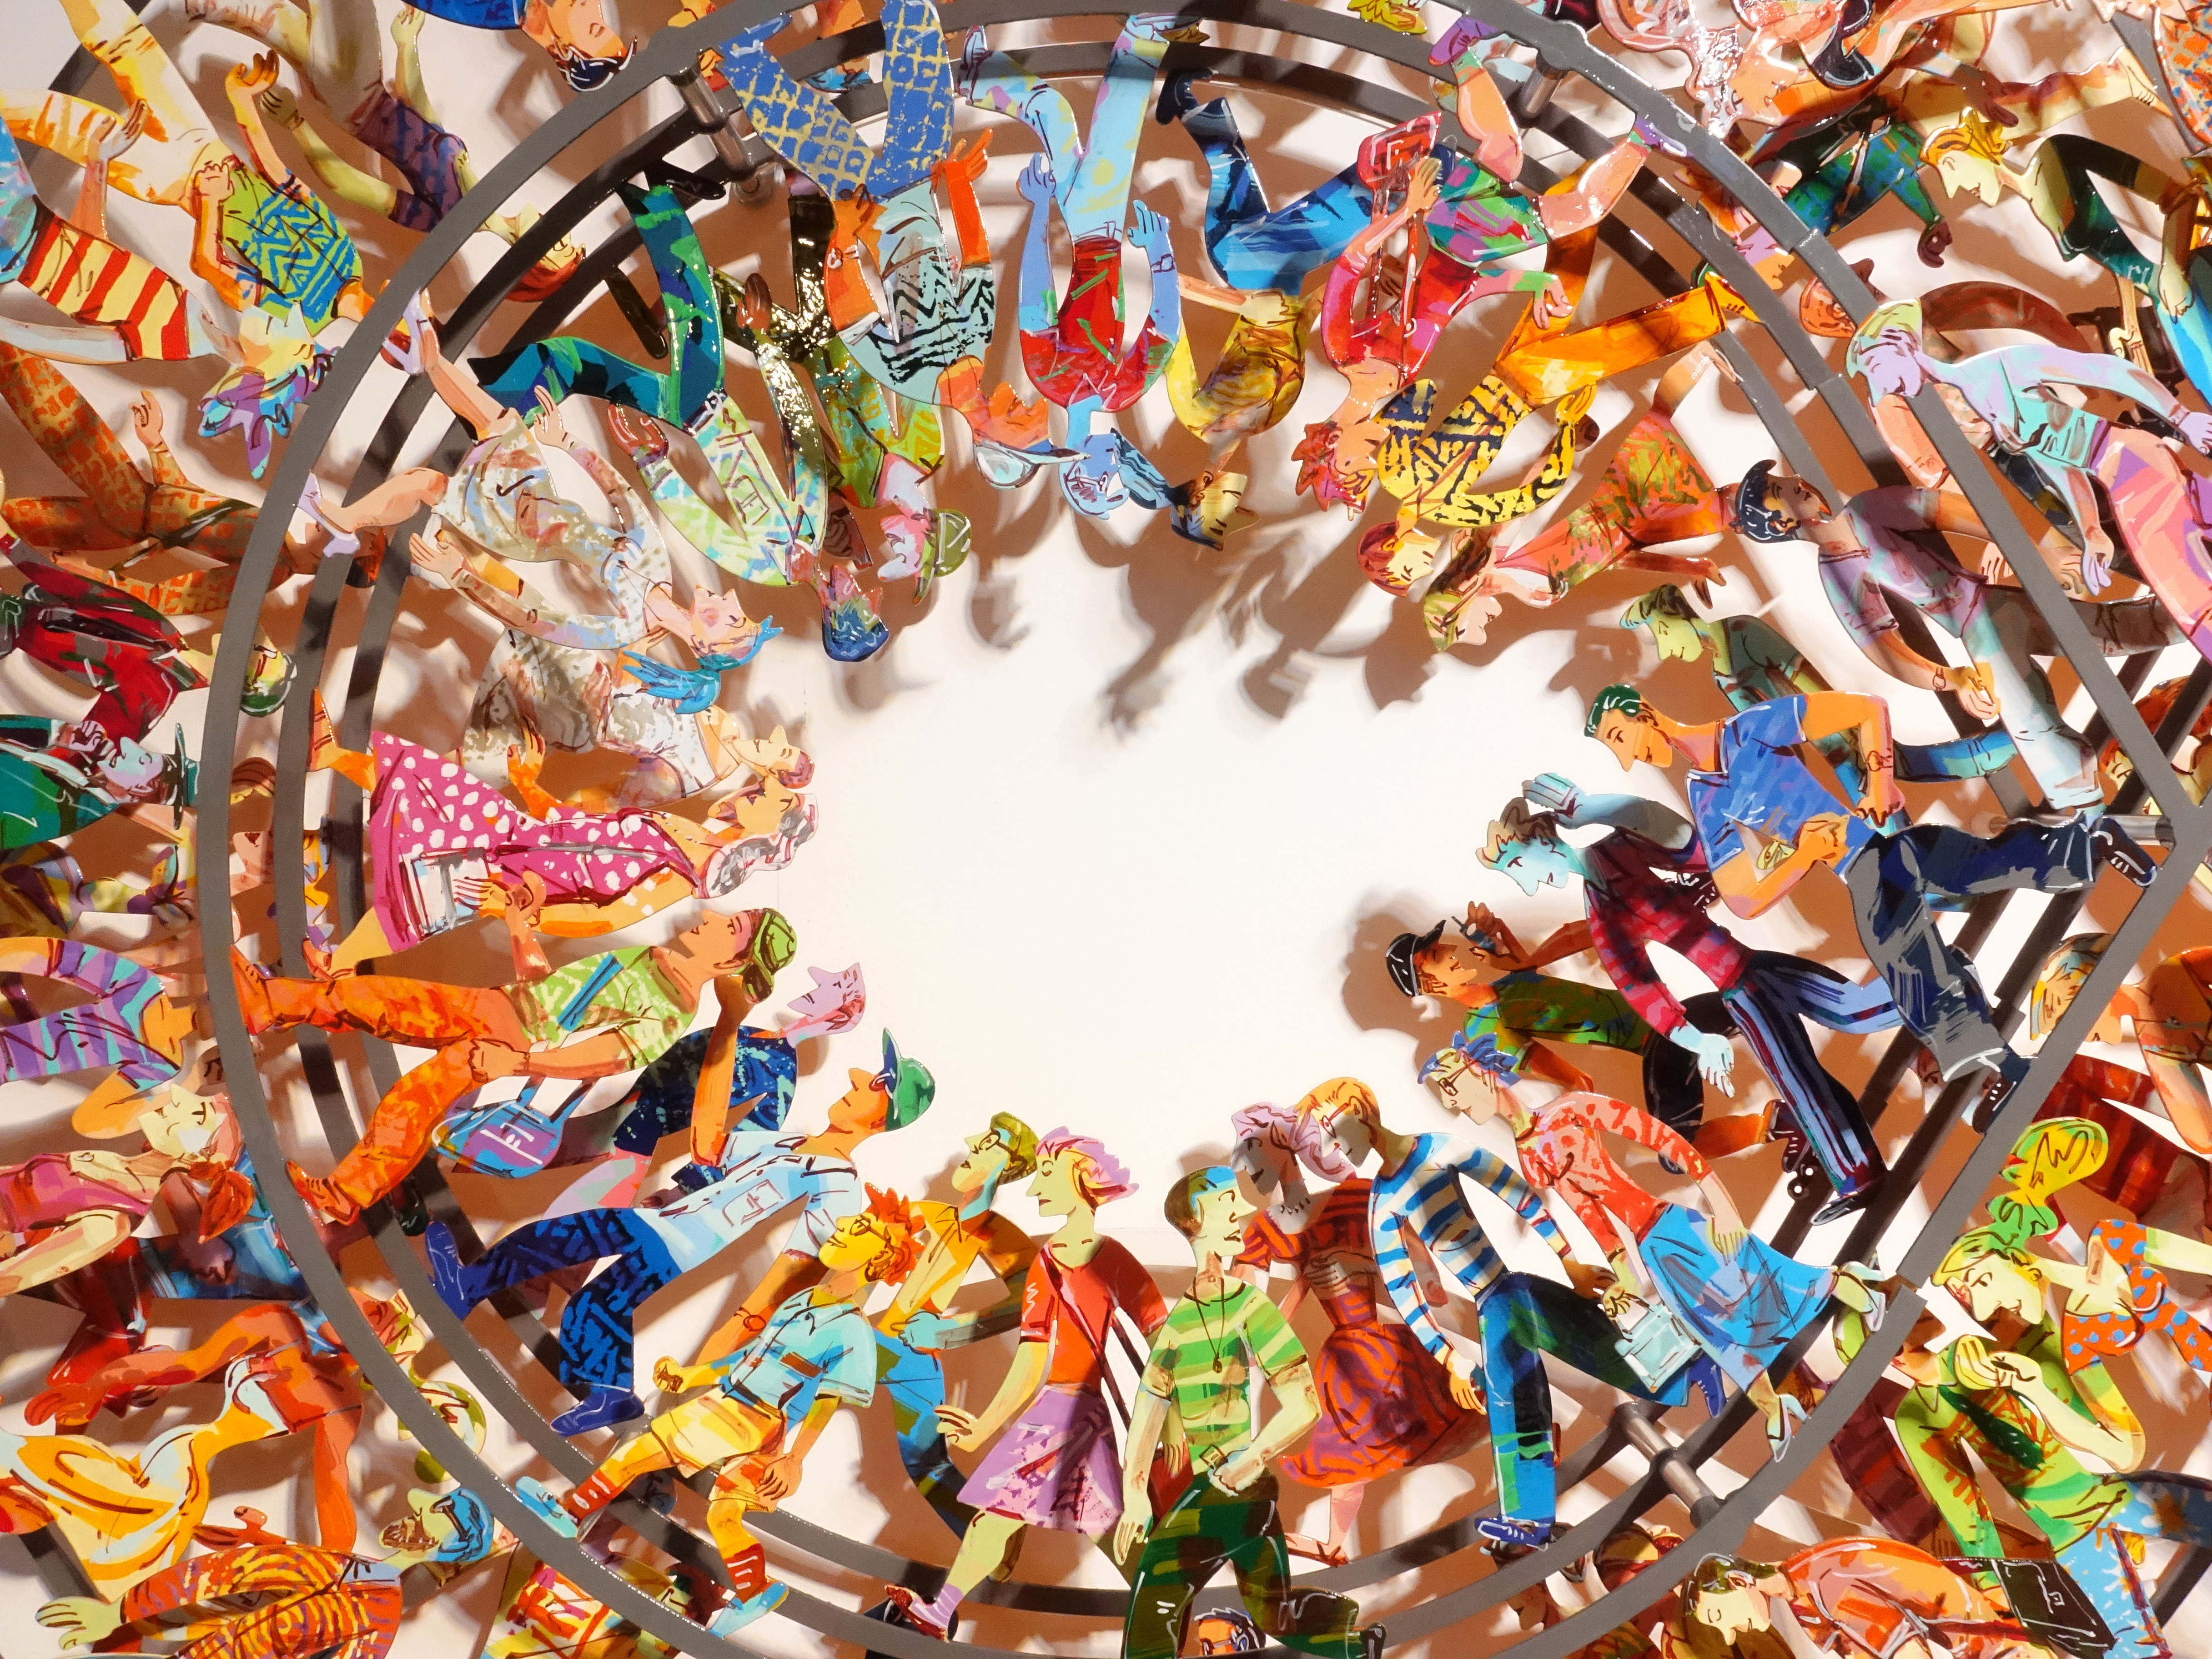 David Gerstein,《Endless Walk》細節,95 x 160 x 15 cm,Aluminum鋁3層,2010。